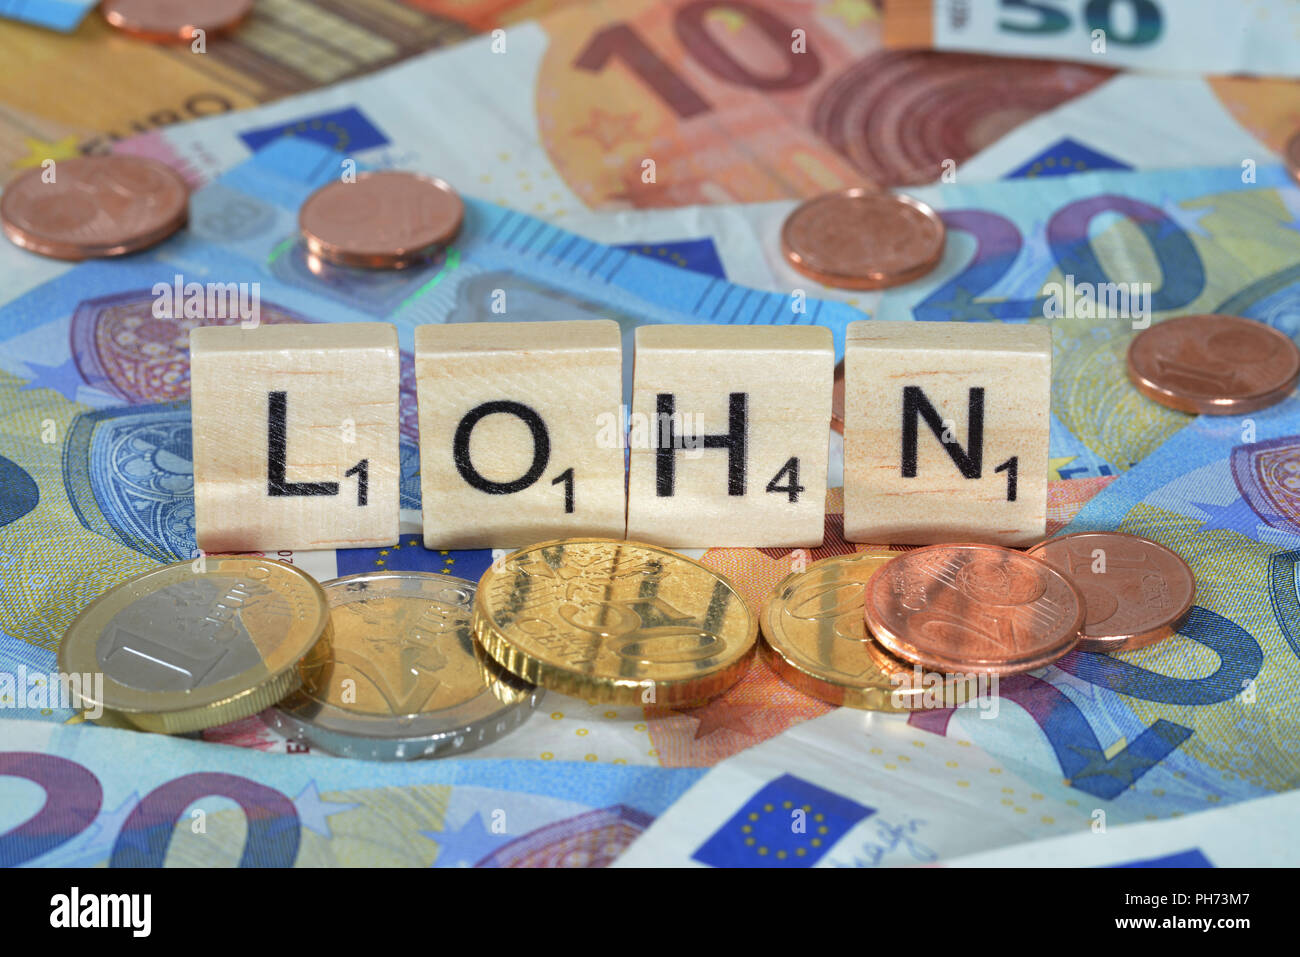 Symbolfoto Wirtschaftsbegriff Lohn Stock Photo